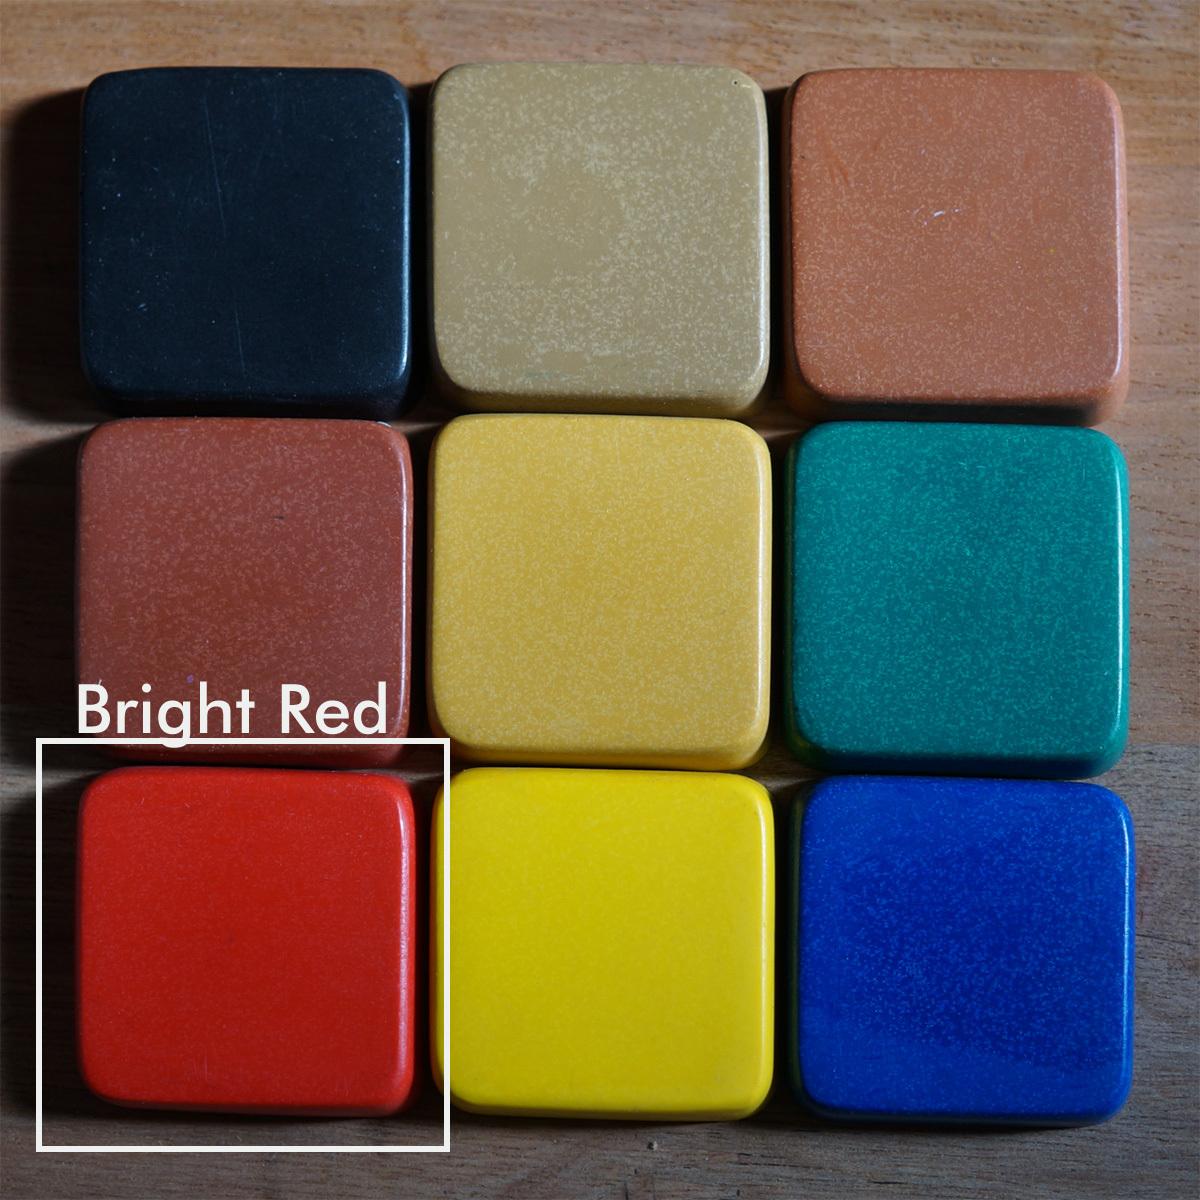 PIGMENT BRIGHT RED 100g(着色剤:赤 100g) - 画像2